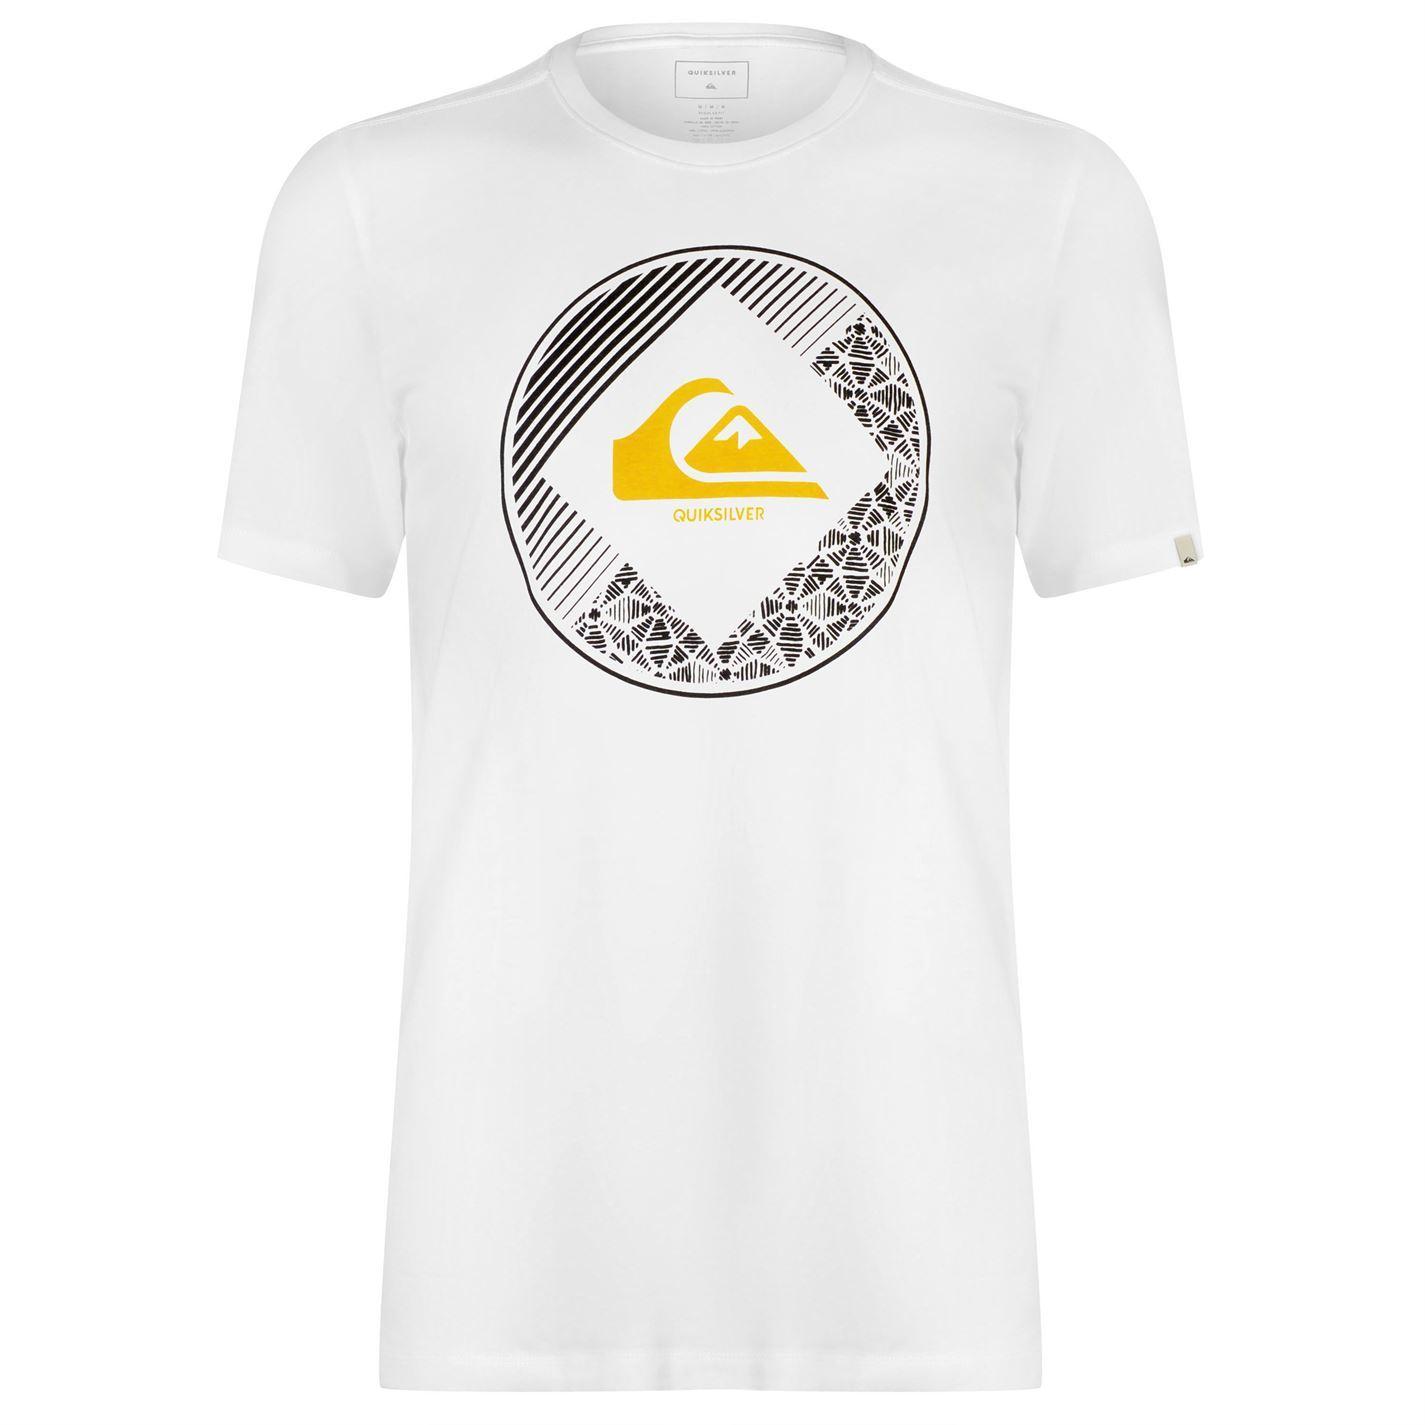 Quiksilver-Diamond-Logo-T-Shirt-Mens-Top-Tee-Shirt-White-Small thumbnail 6